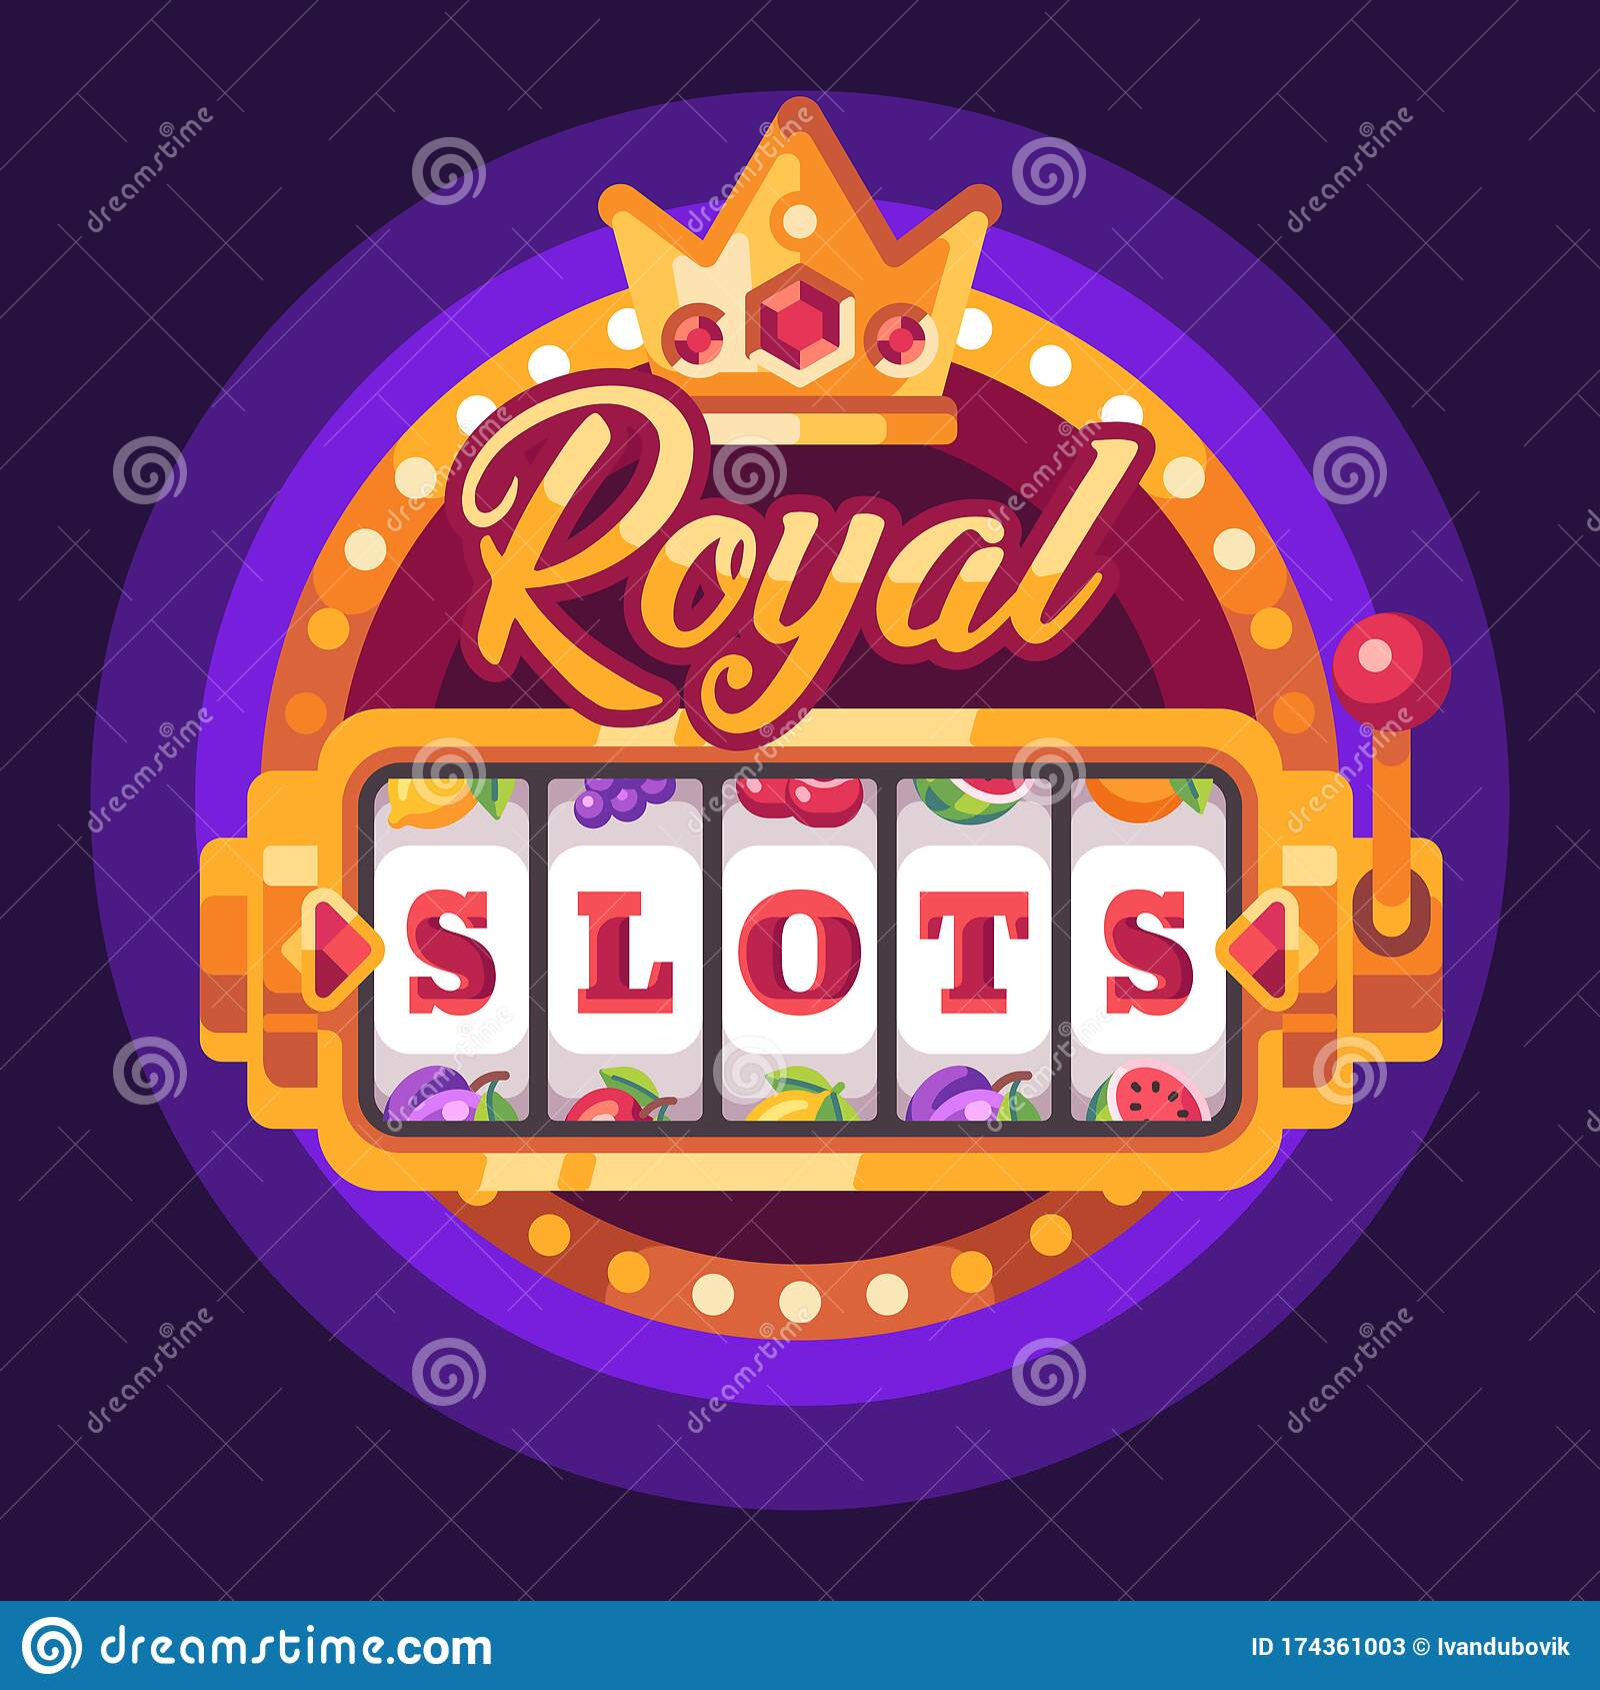 Royal Slots Golden Slot Machine Casino Flat Illustration Stock Vector Illustration Of Design Vector 174361003